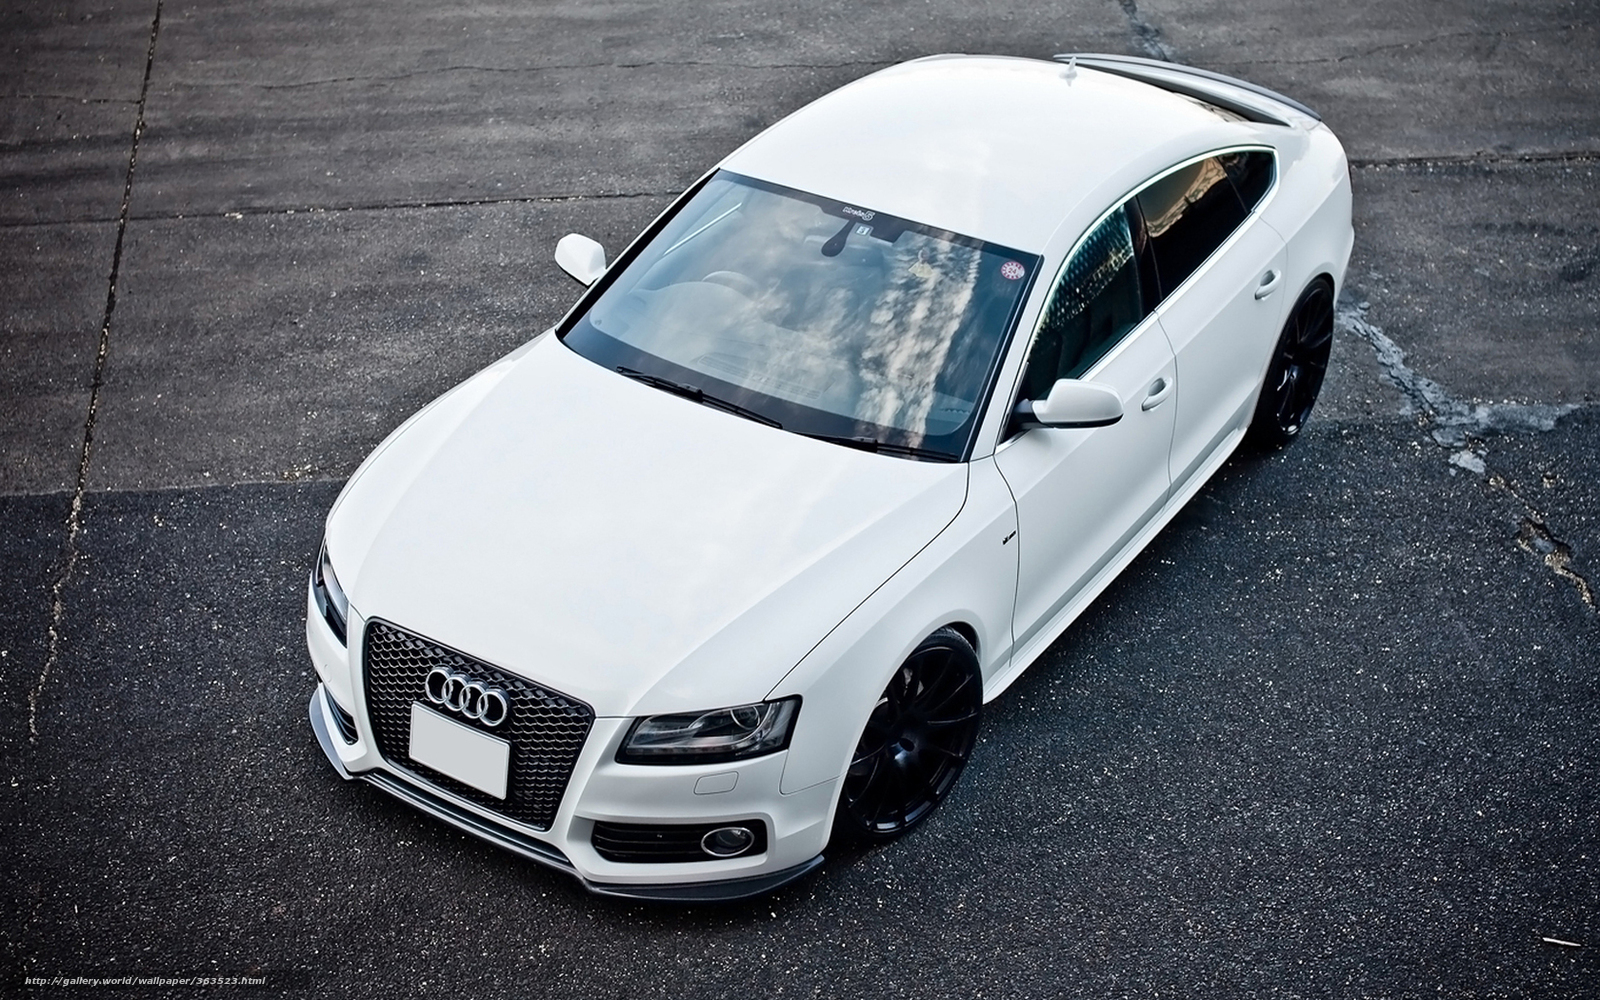 Download Wallpaper Audi Asphalt Audi Free Desktop